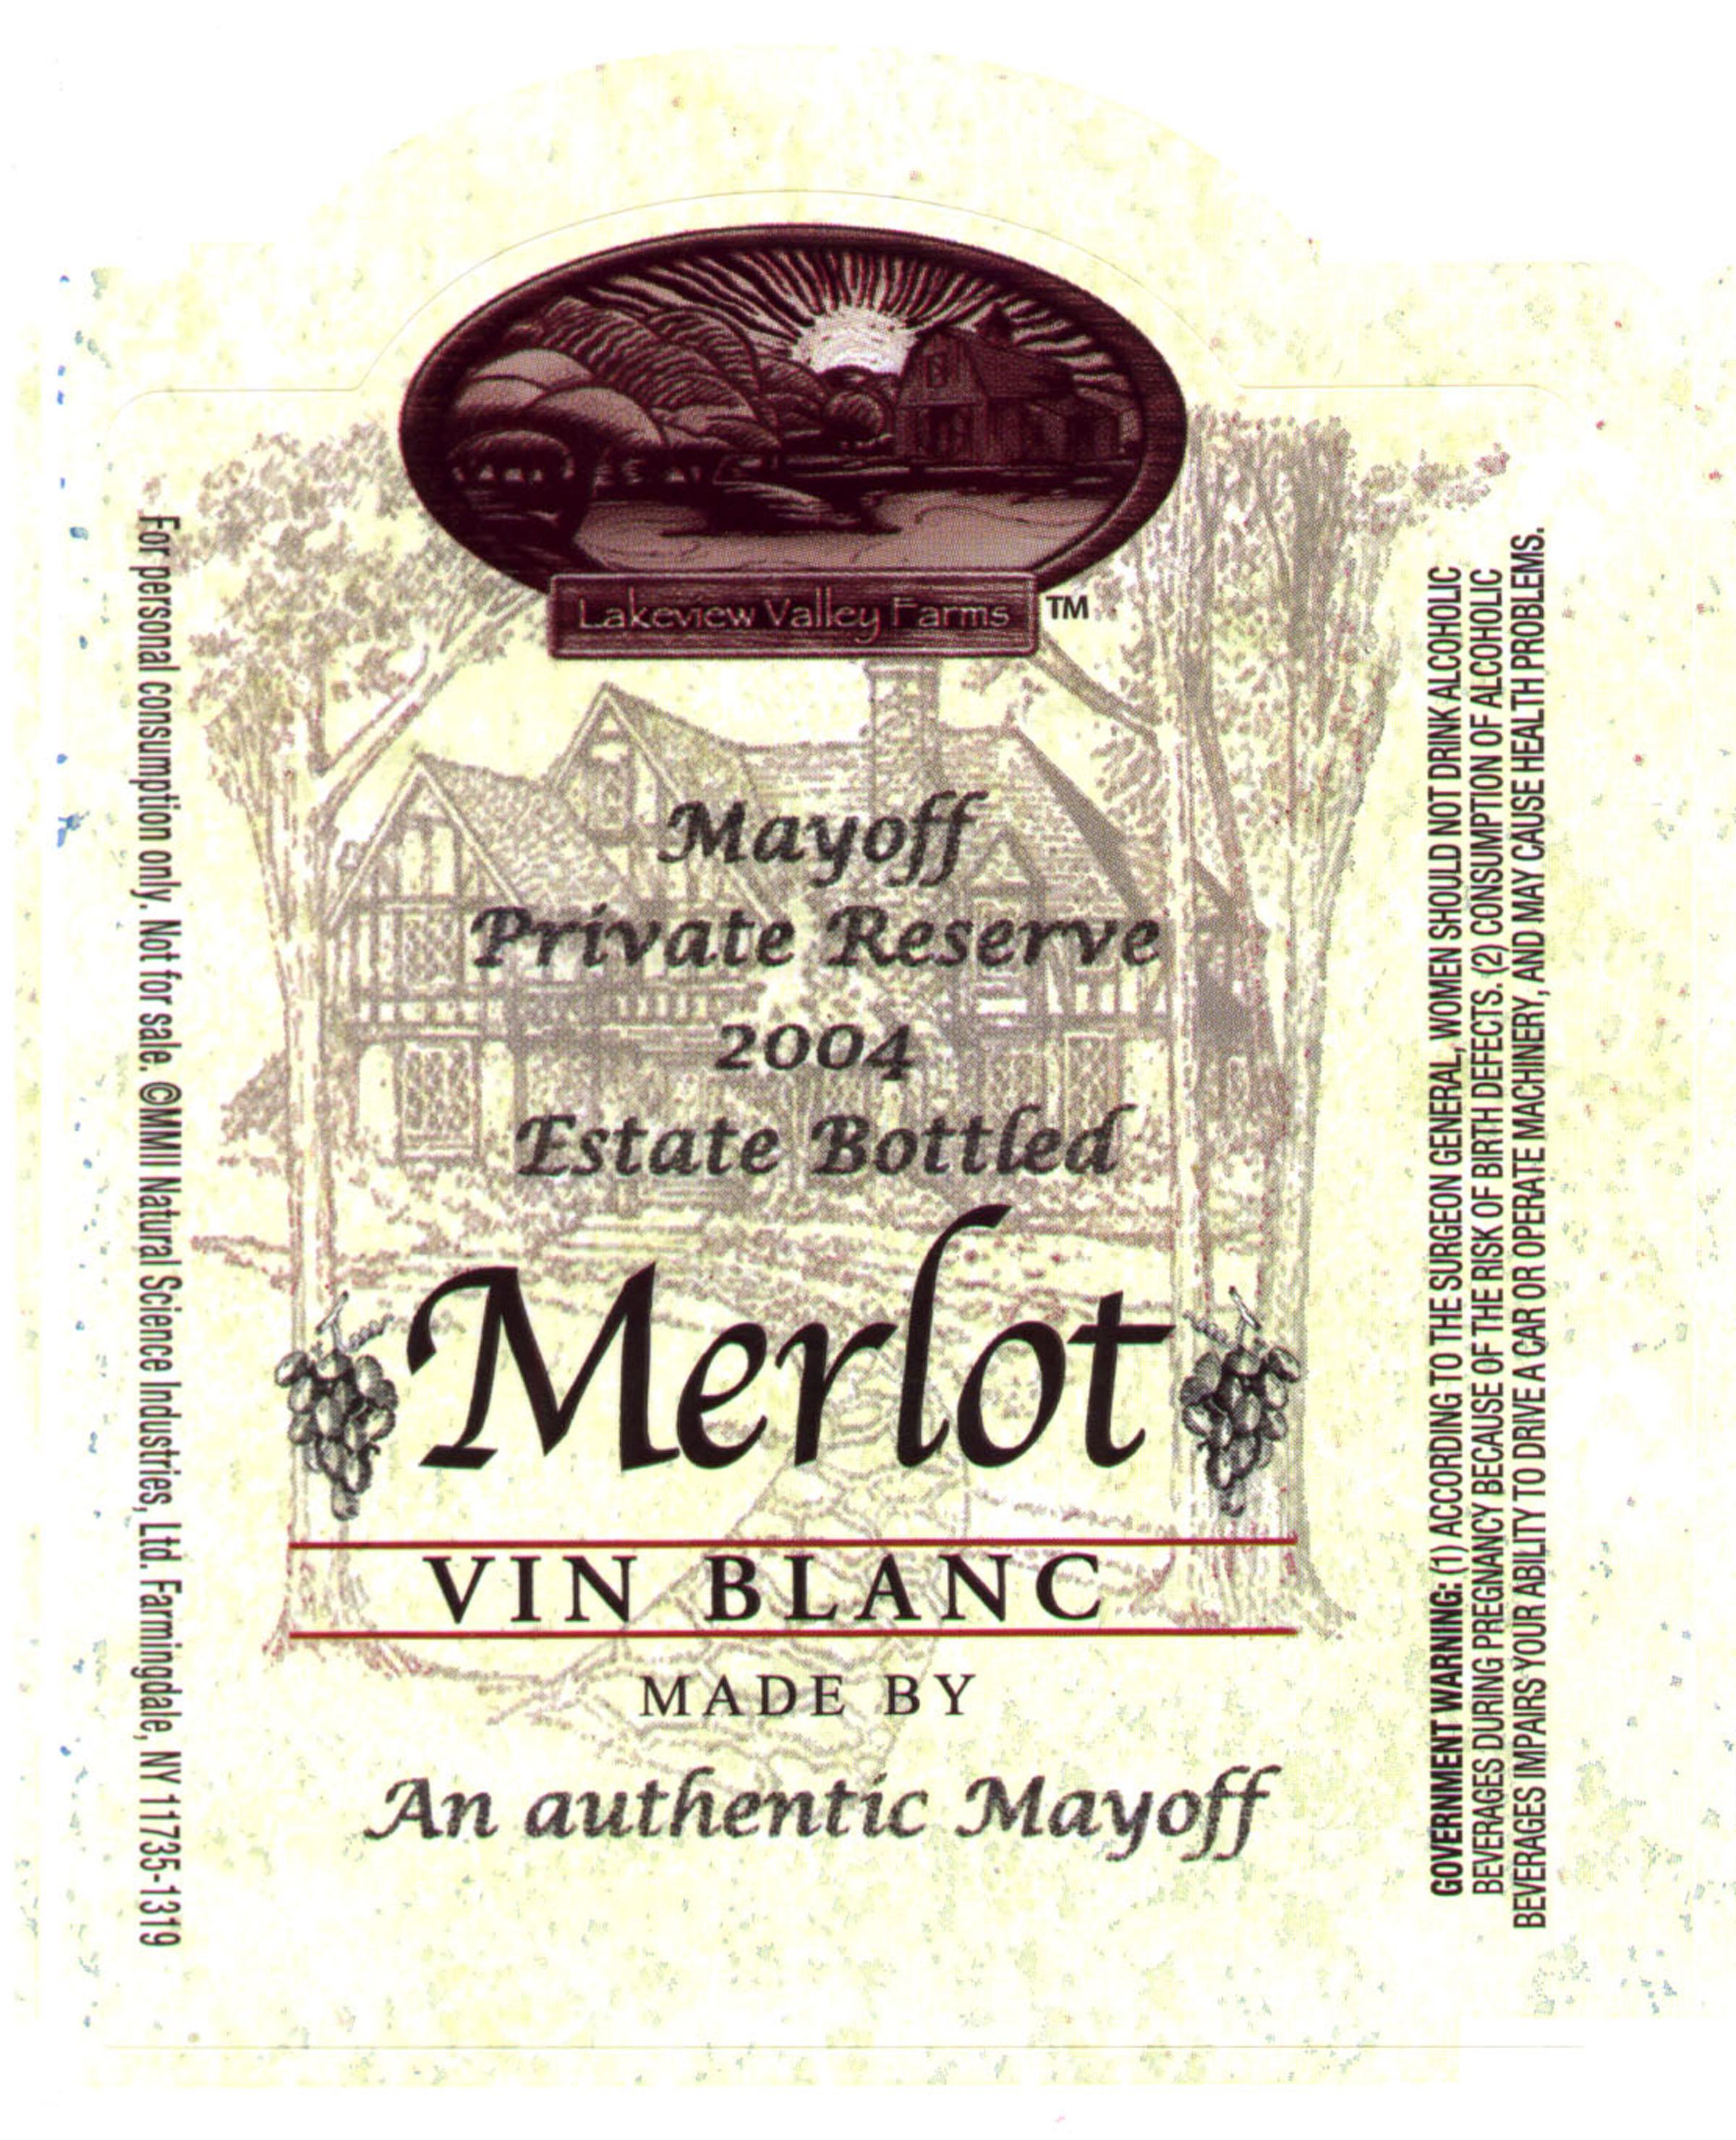 wine label, vintage Mayoff 2004